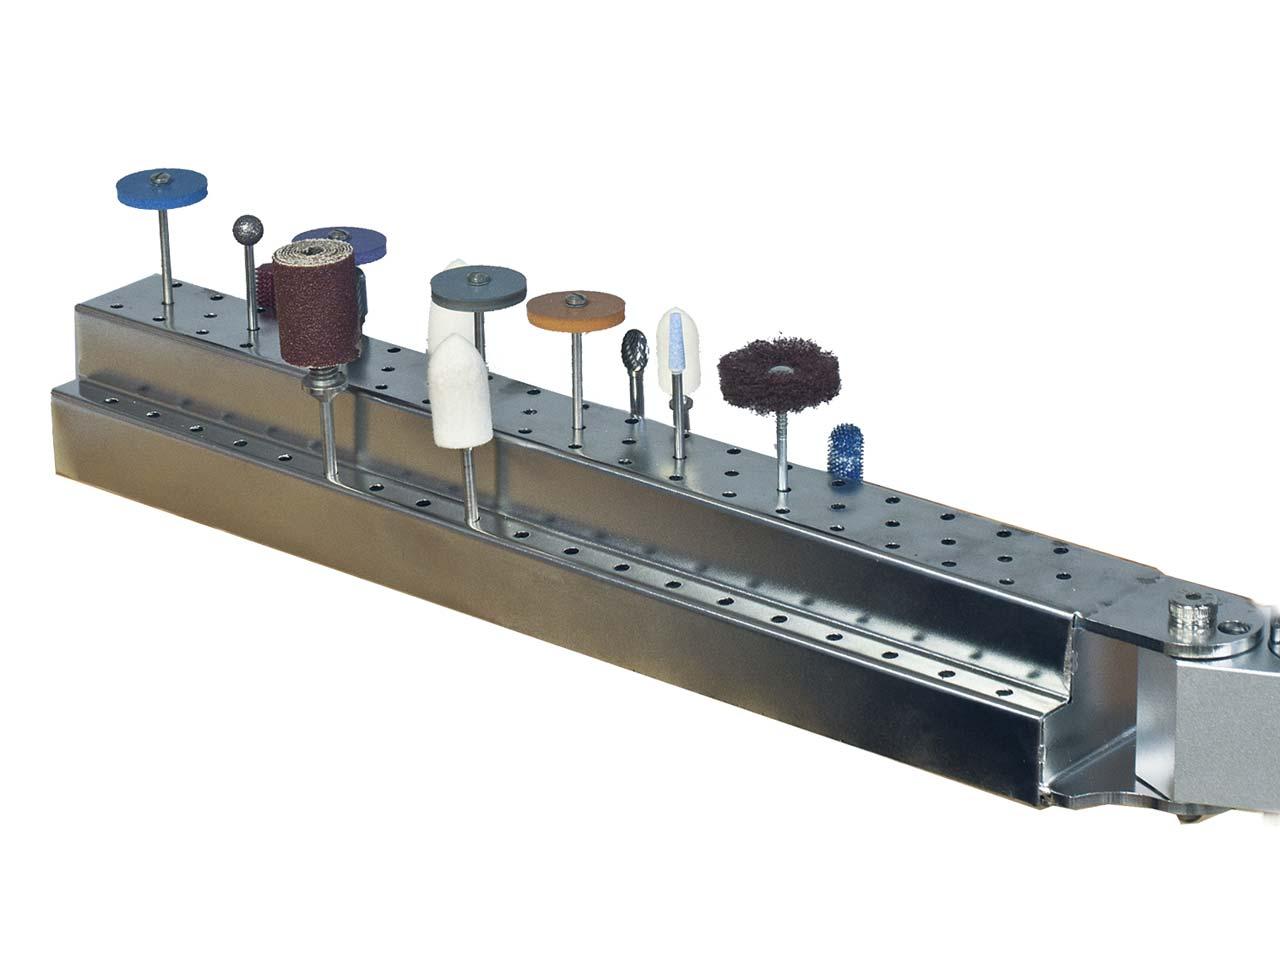 Genuine-US-Foredom-Workbench-Accessories-System miniatura 3